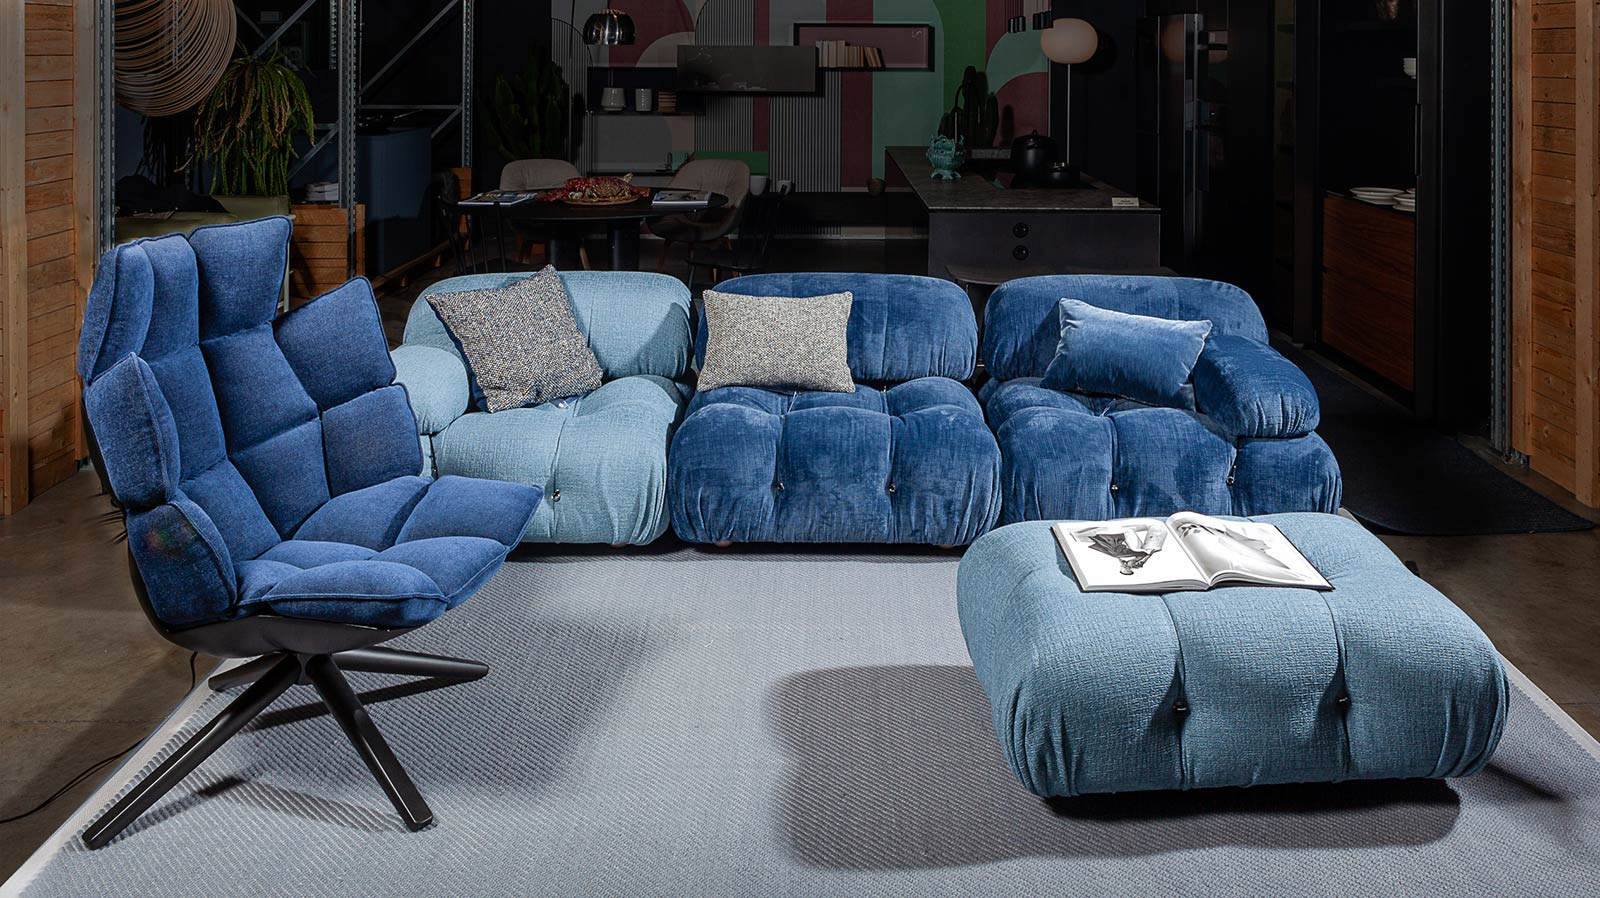 divano camaleonda B&B con poltrona husk